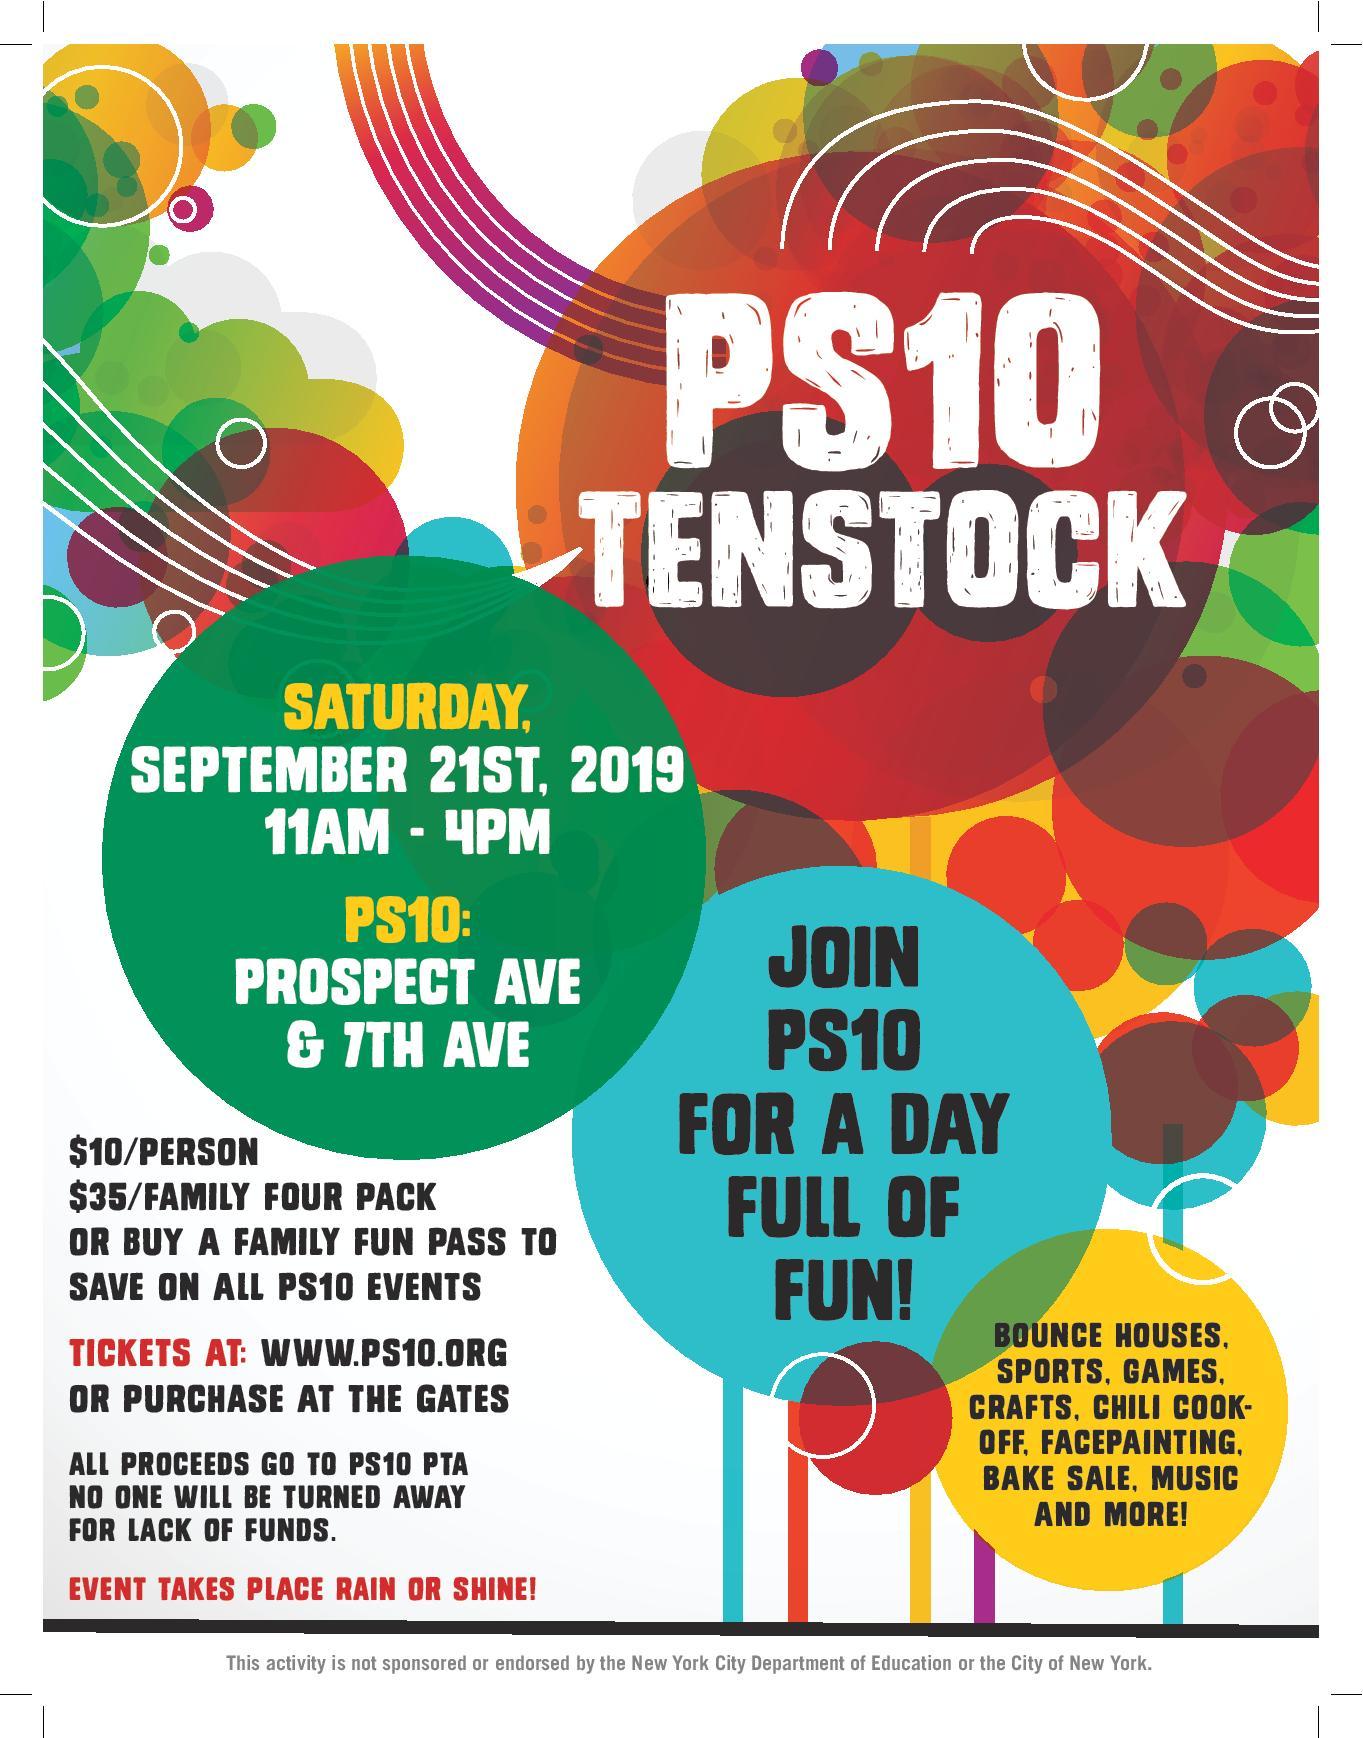 PS10_Tenstock 2019_school-page-001.jpg